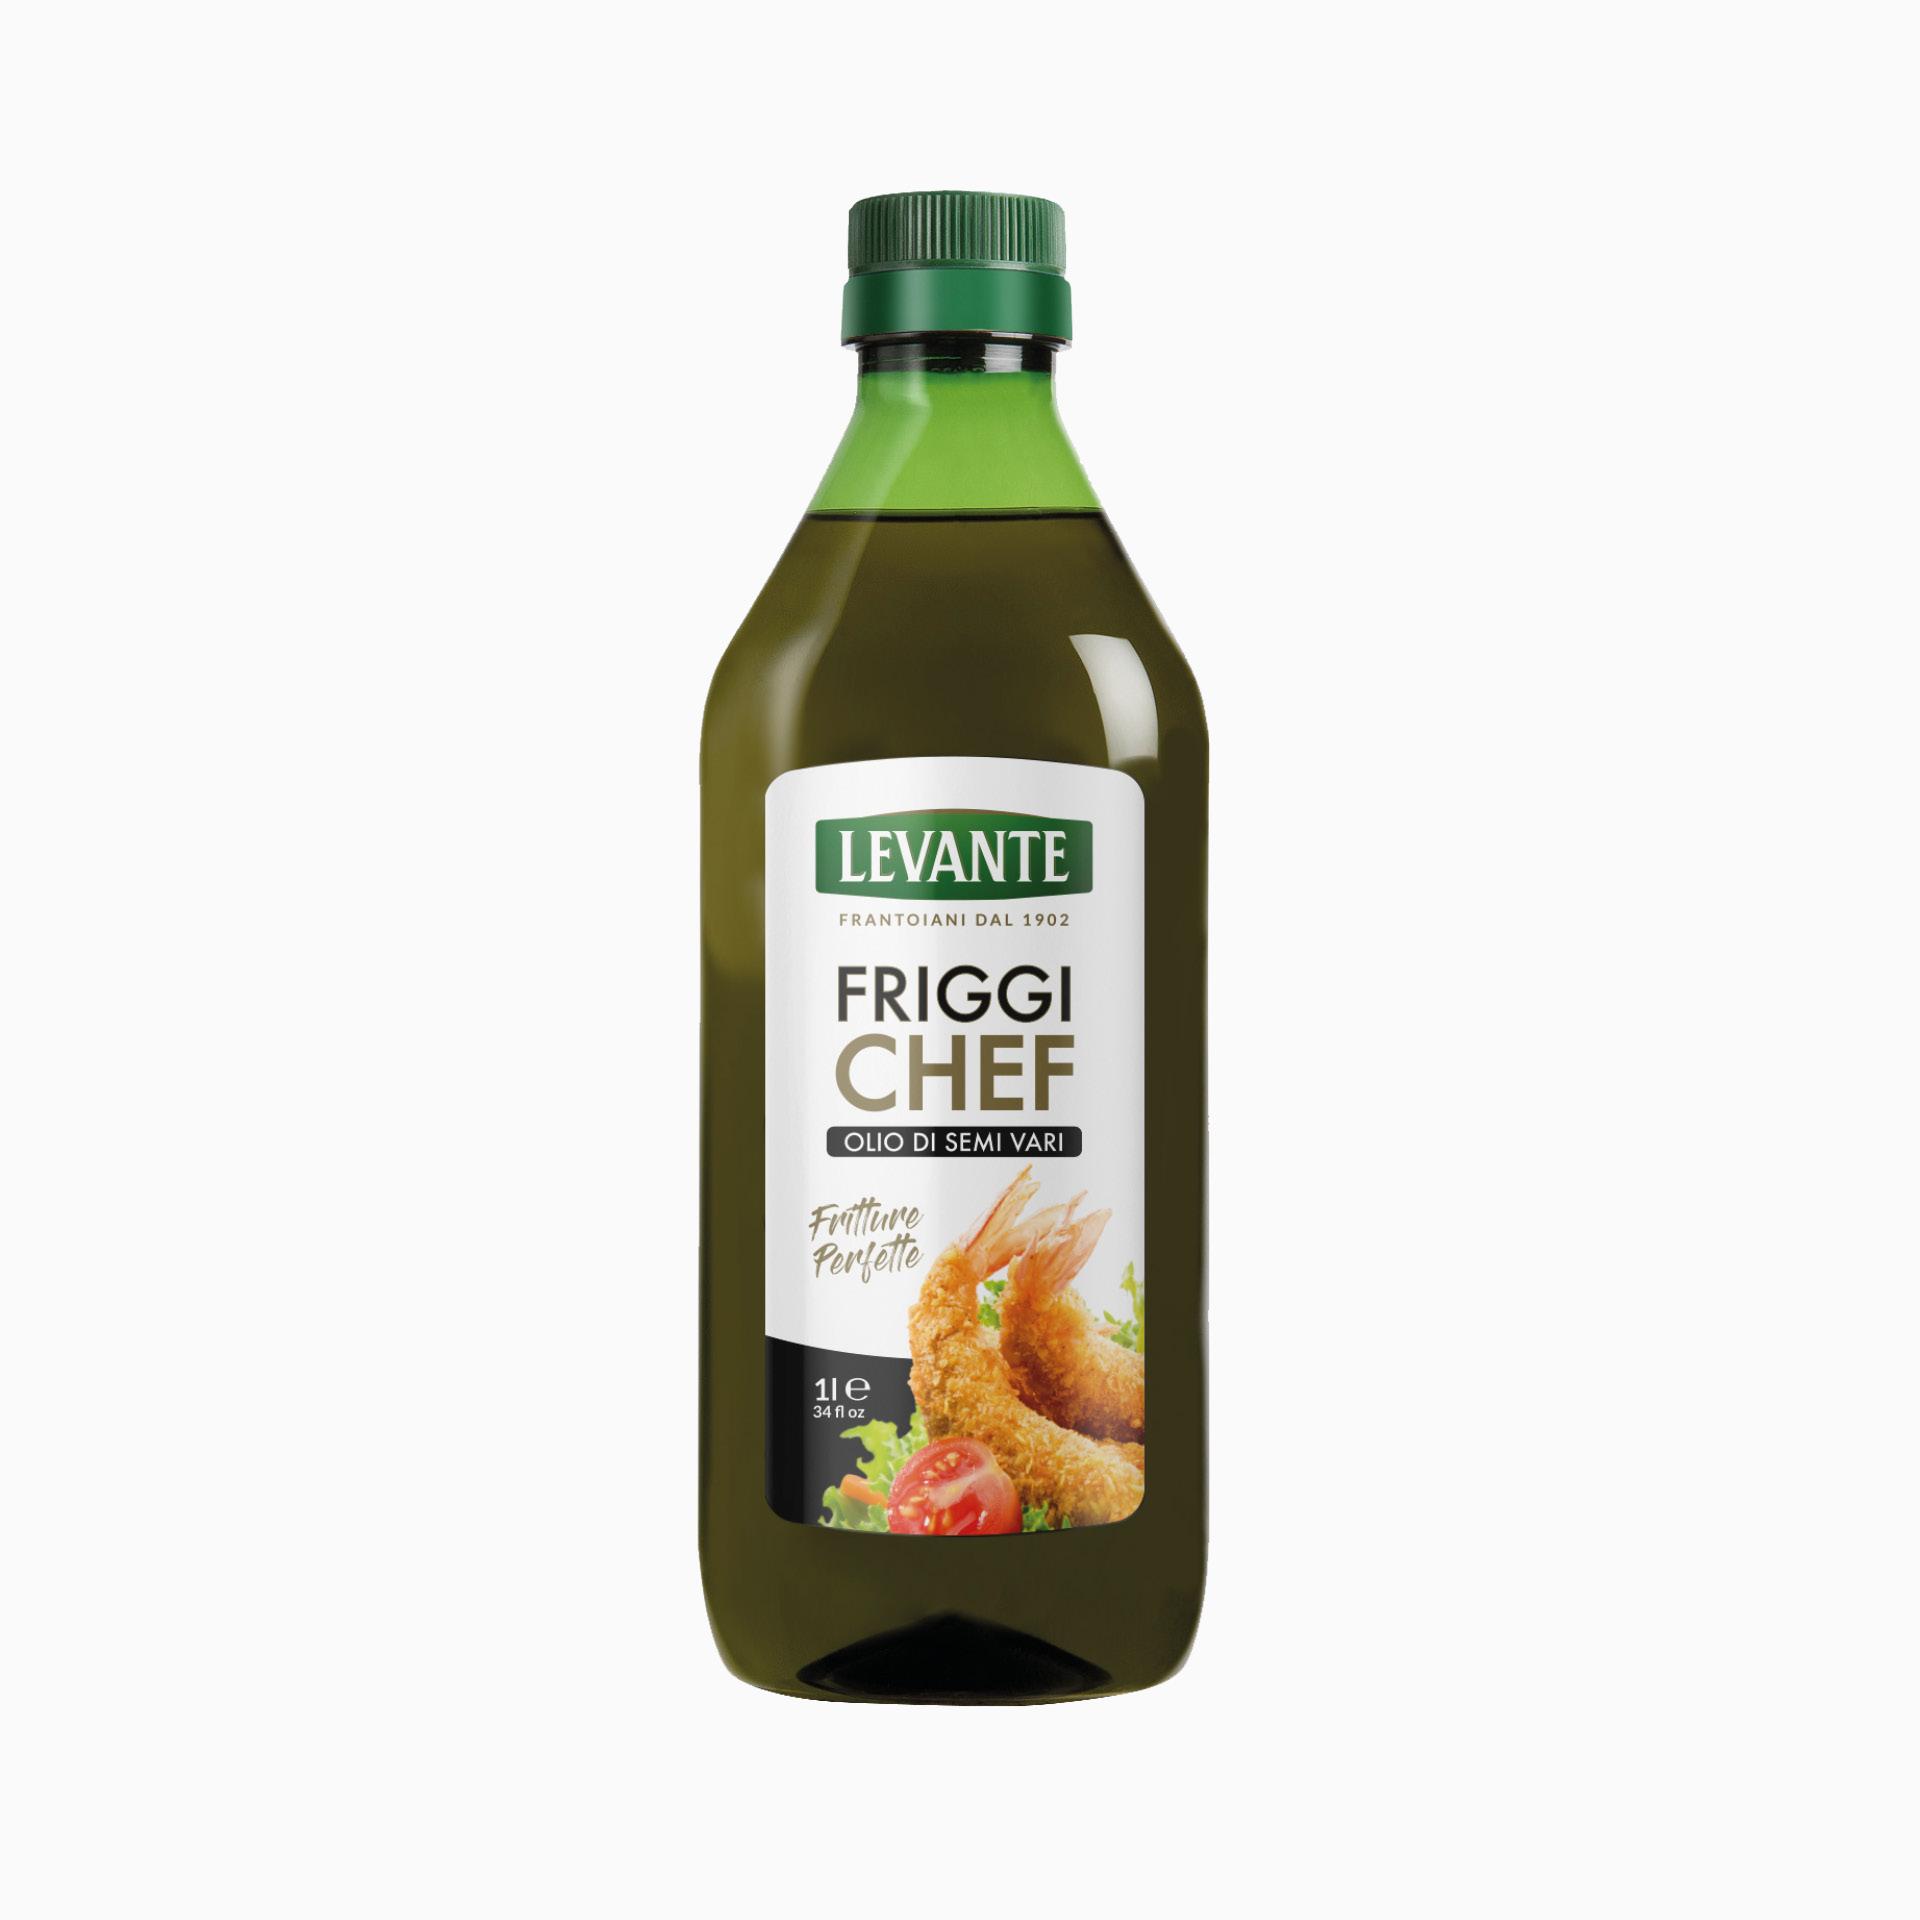 Friggi Chef